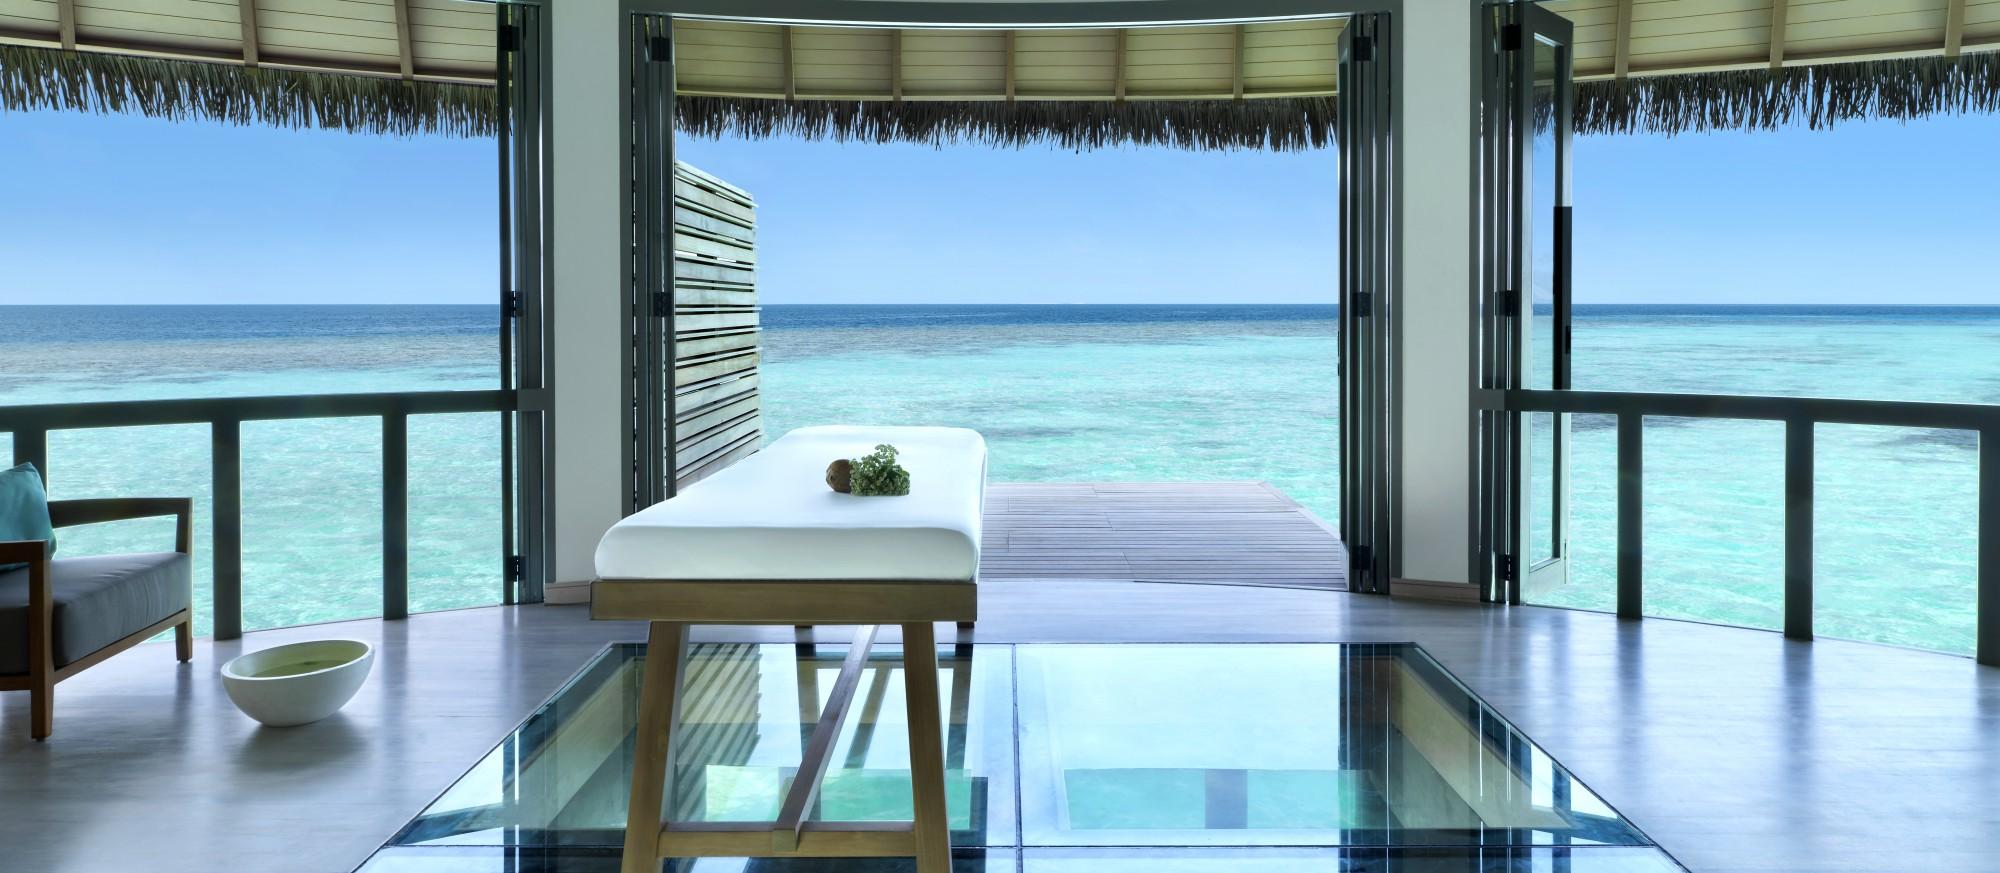 https://www.otdesign.com/wp-content/uploads/2020/11/OTdesign_MeranaSpaWellness-treatment-room.jpg